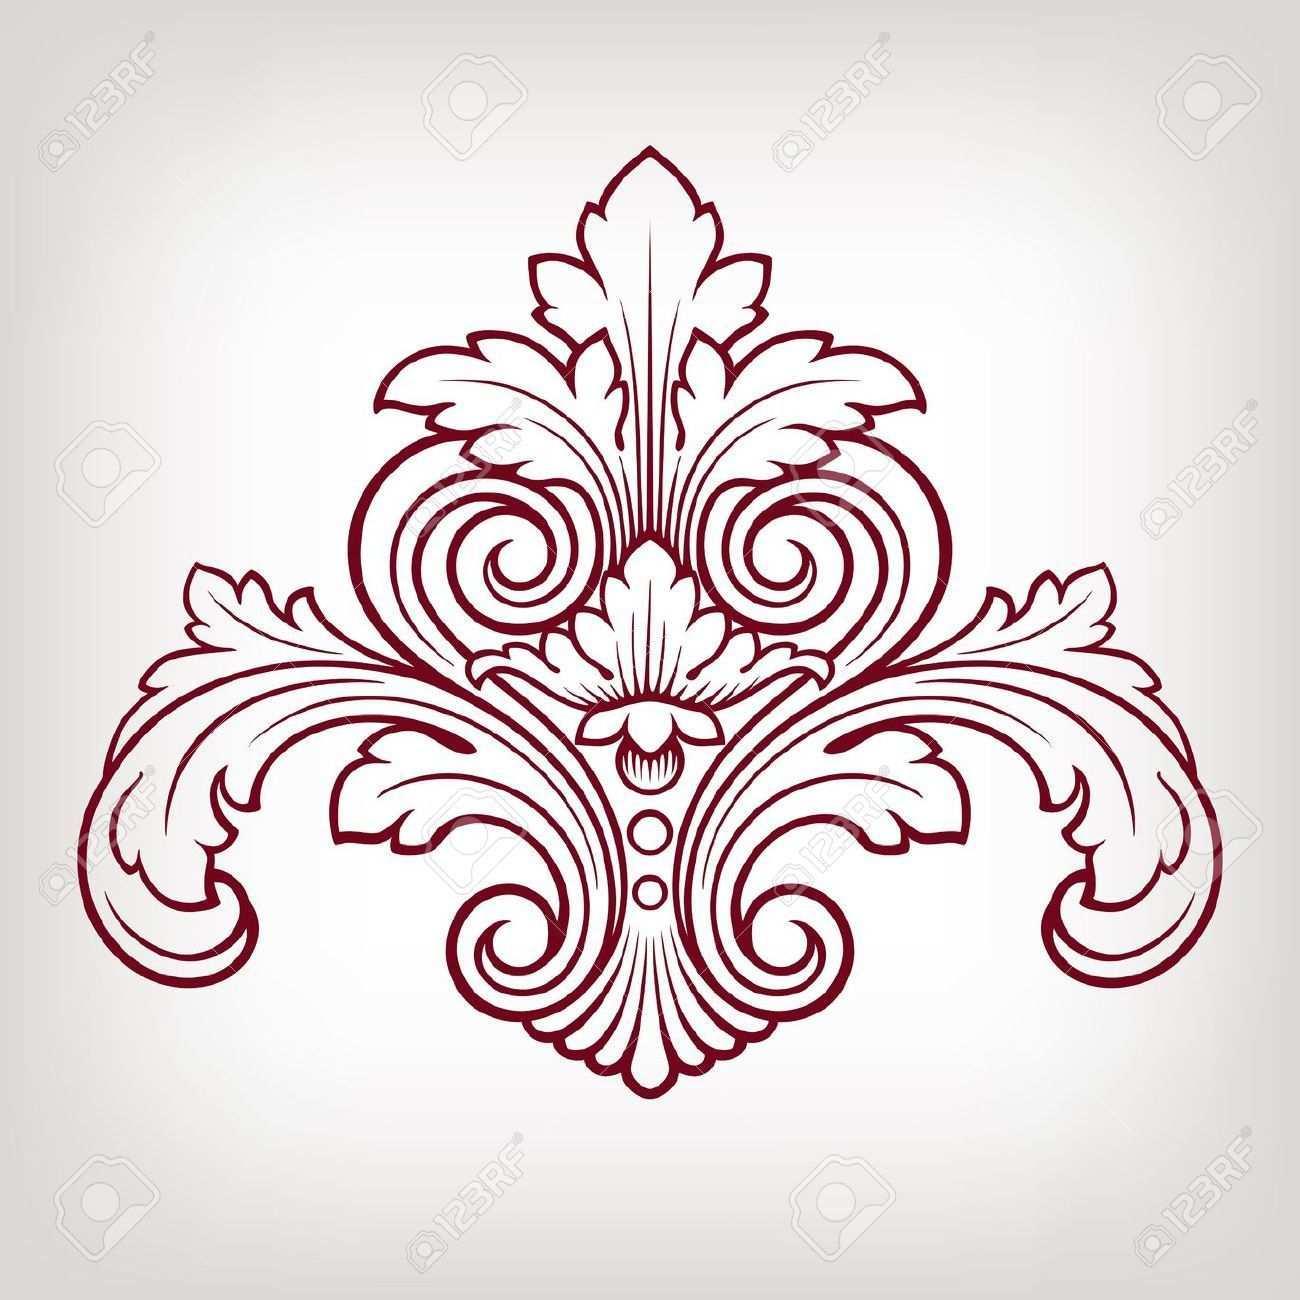 Jahrgang Barock Damastentwurf Rahmen Musterelements Gravur Retro Stil Filigranes Design Ornamente Vorlagen Barock